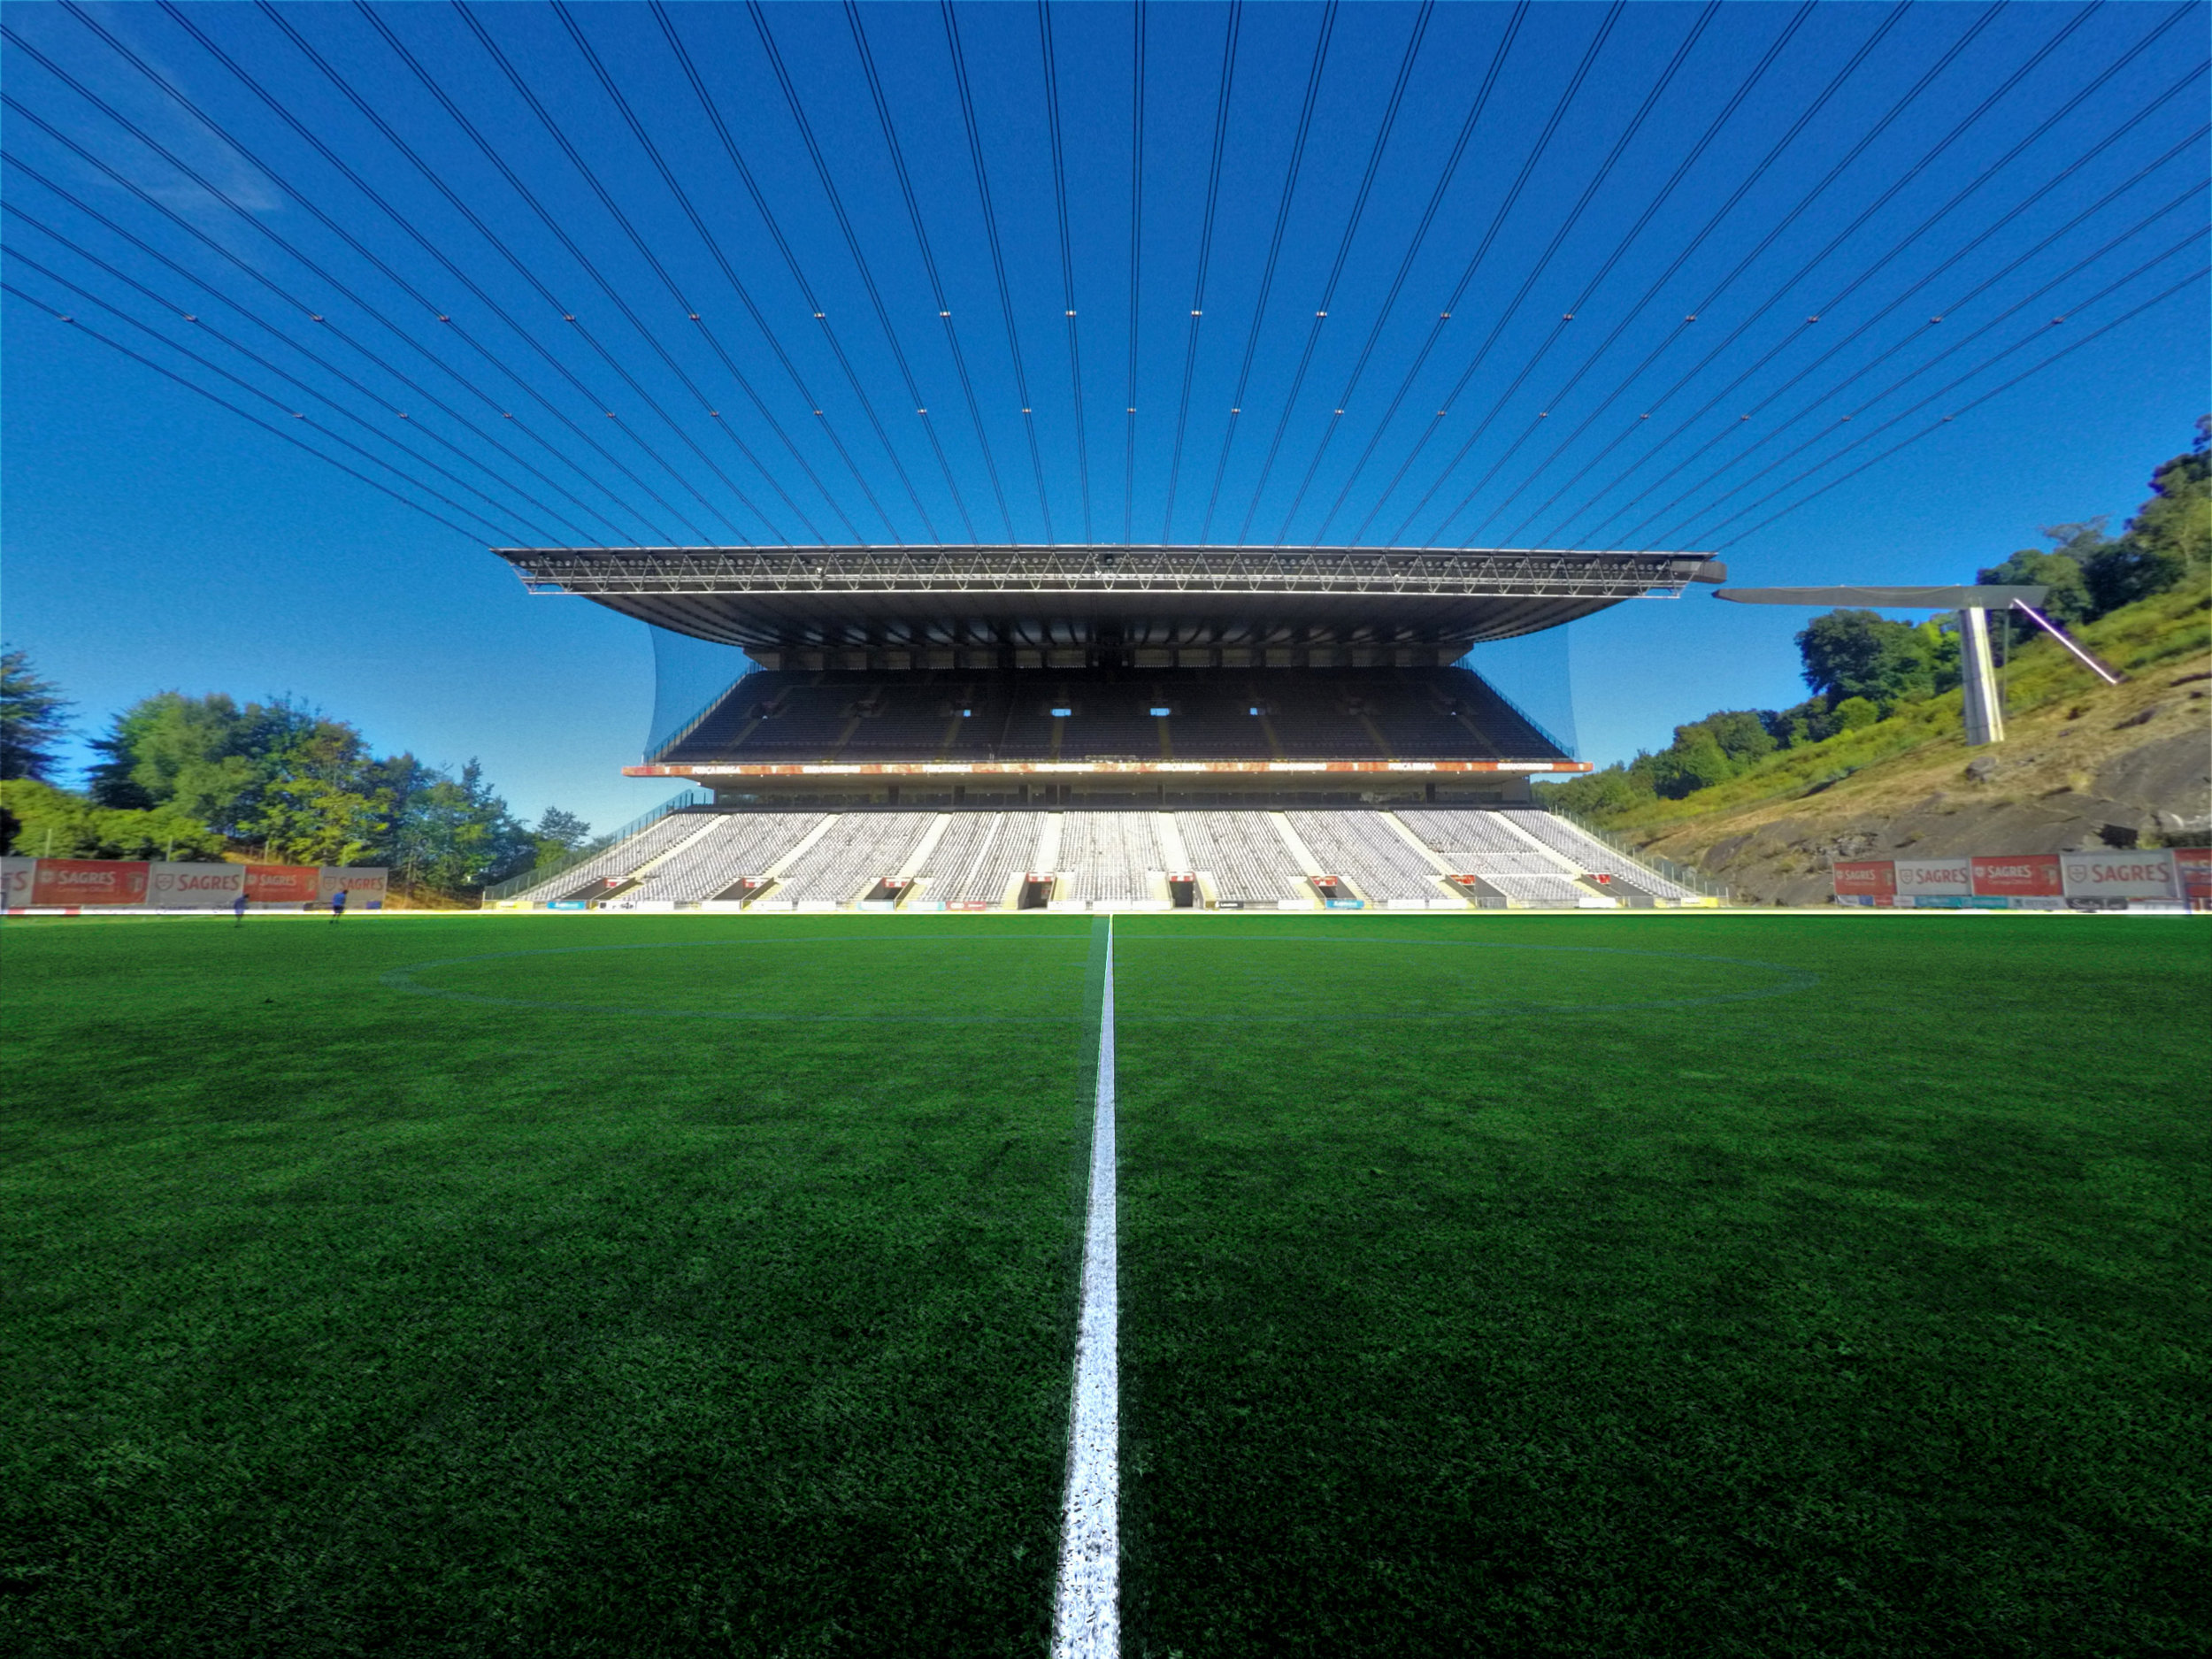 Sporting de braga Stadium - Arch. Souto de Moura / Braga